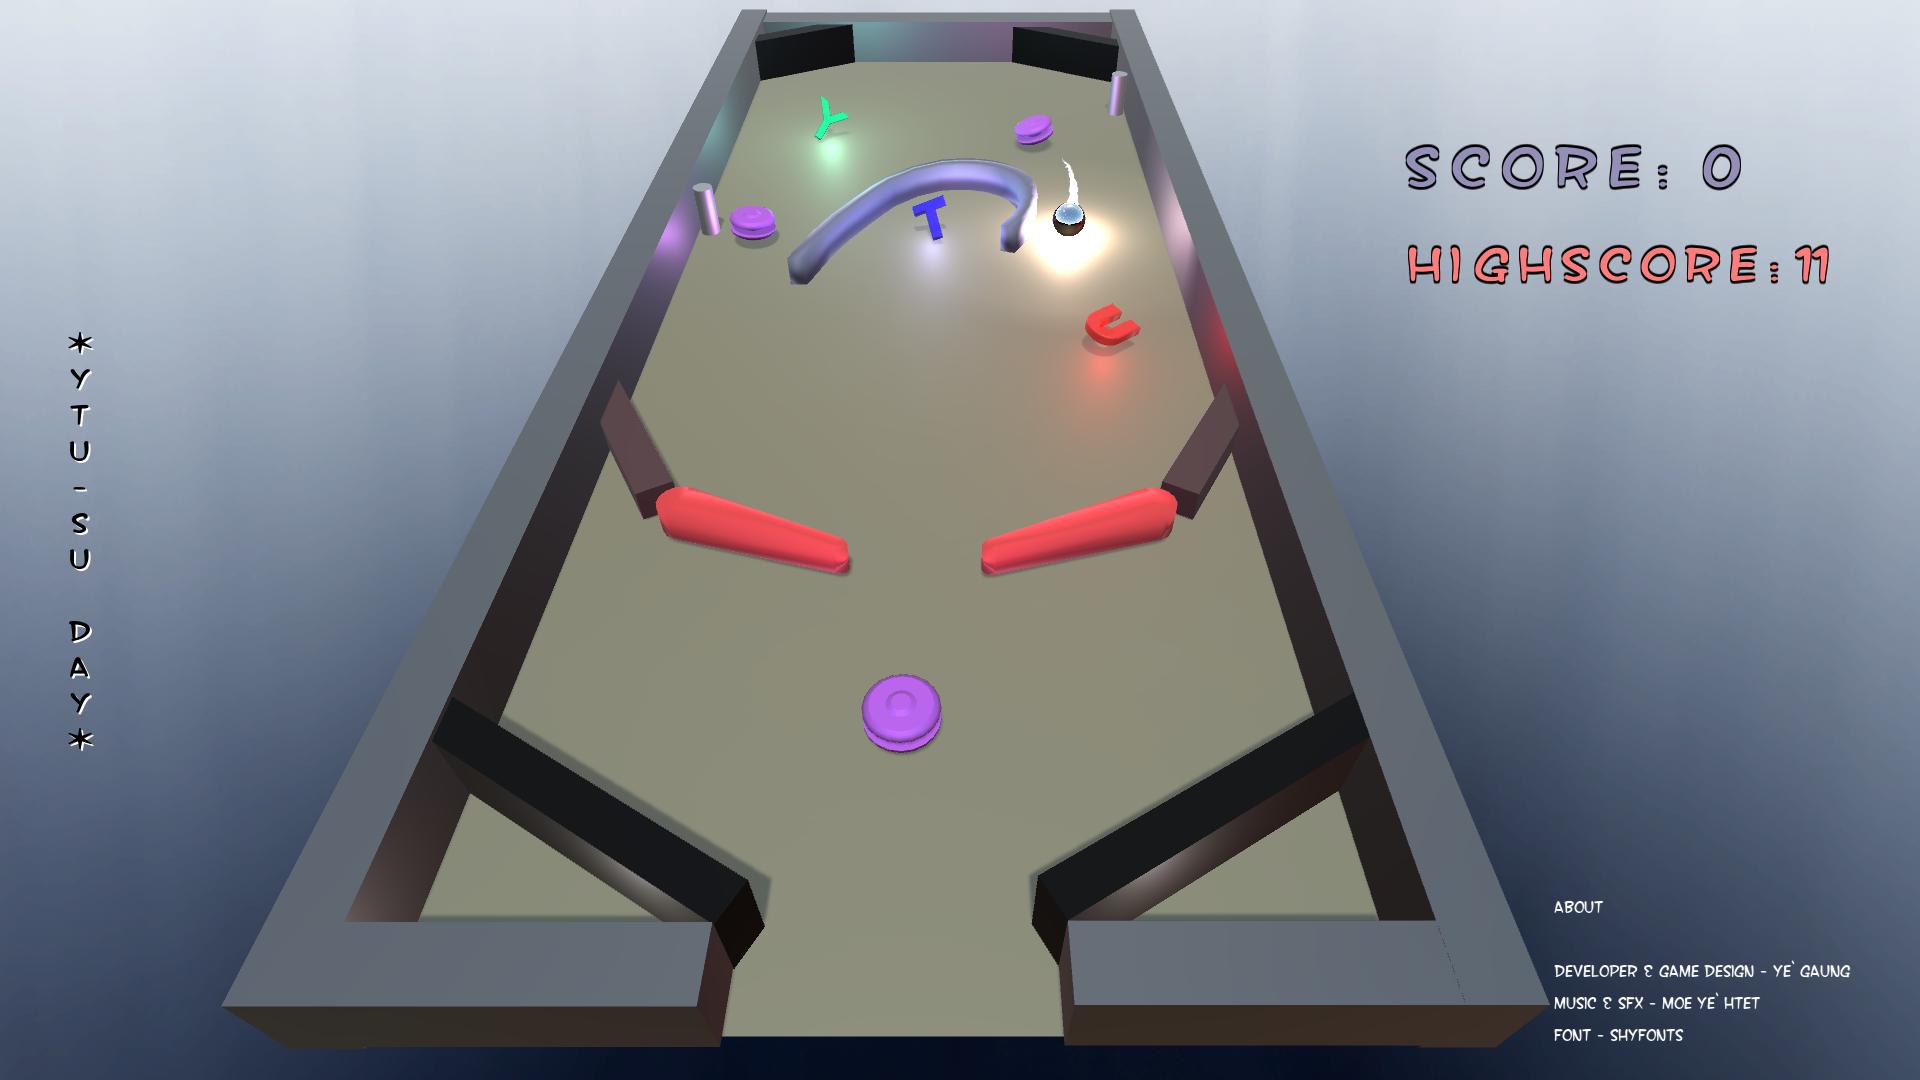 3D Pinball with Ultrasonic Sensors